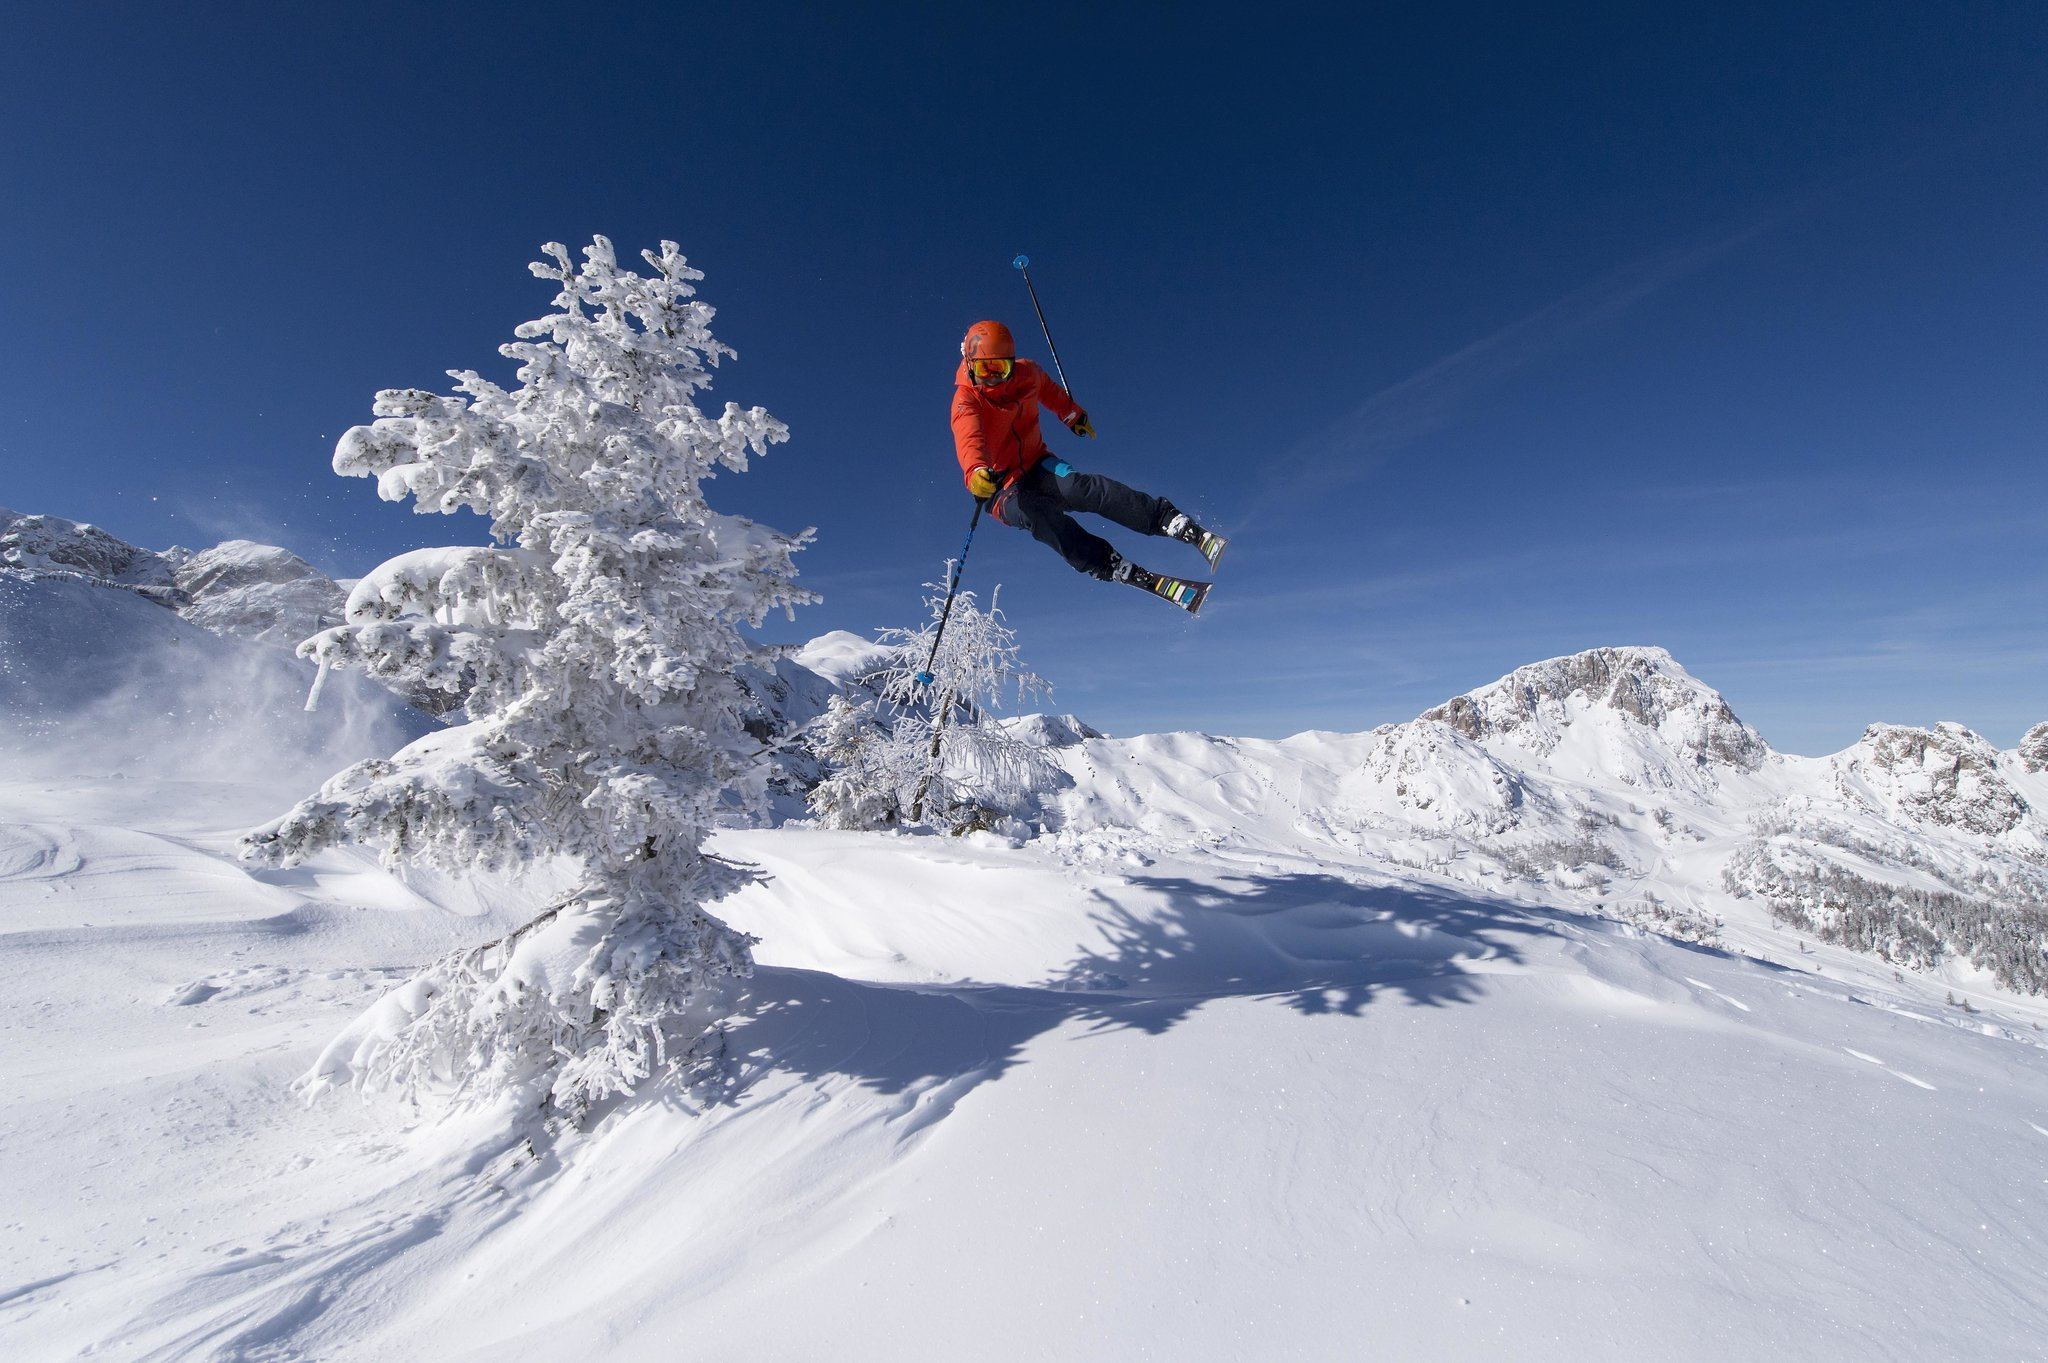 wintersaison 2018 2019 neue ski partner f r das nassfeld hermagor. Black Bedroom Furniture Sets. Home Design Ideas